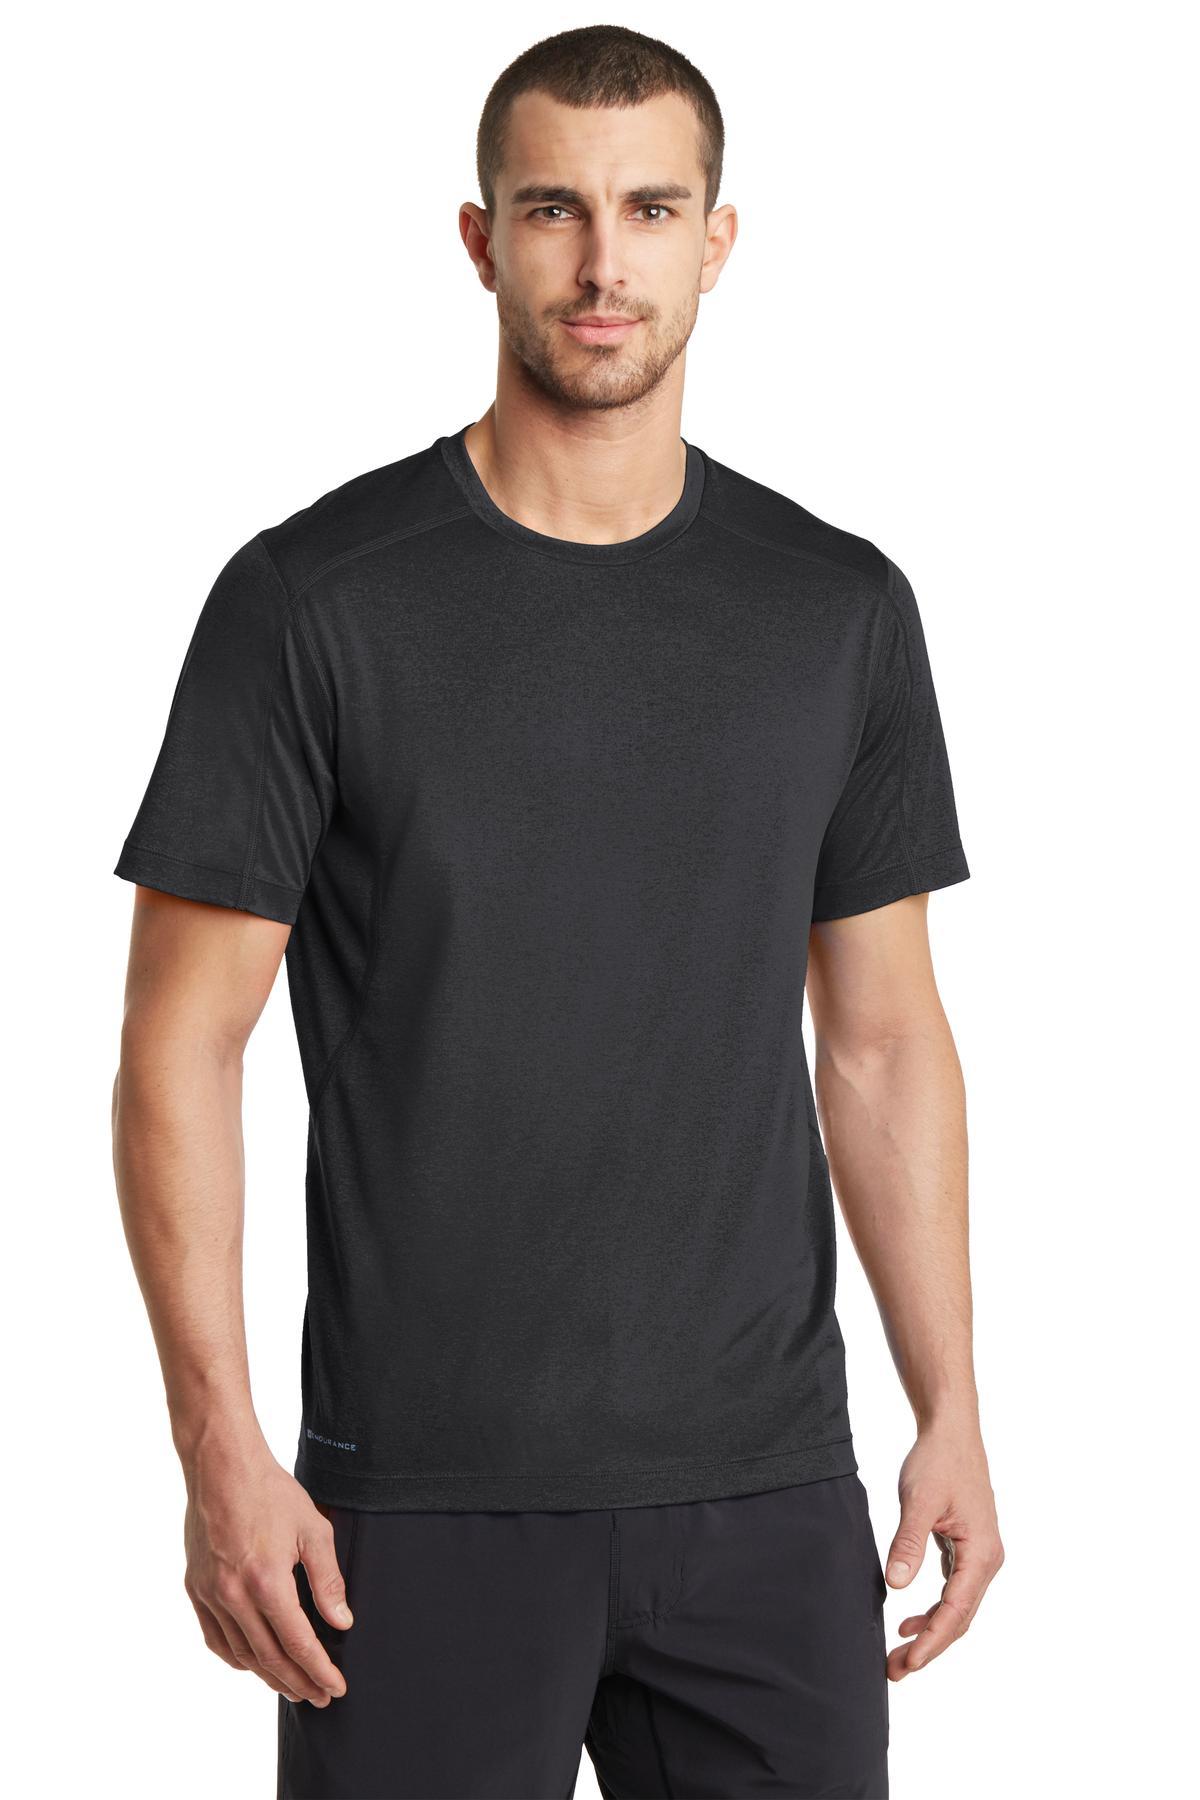 924691291-120 - OGIO® Endurance Pulse Crew Shirt - thumbnail